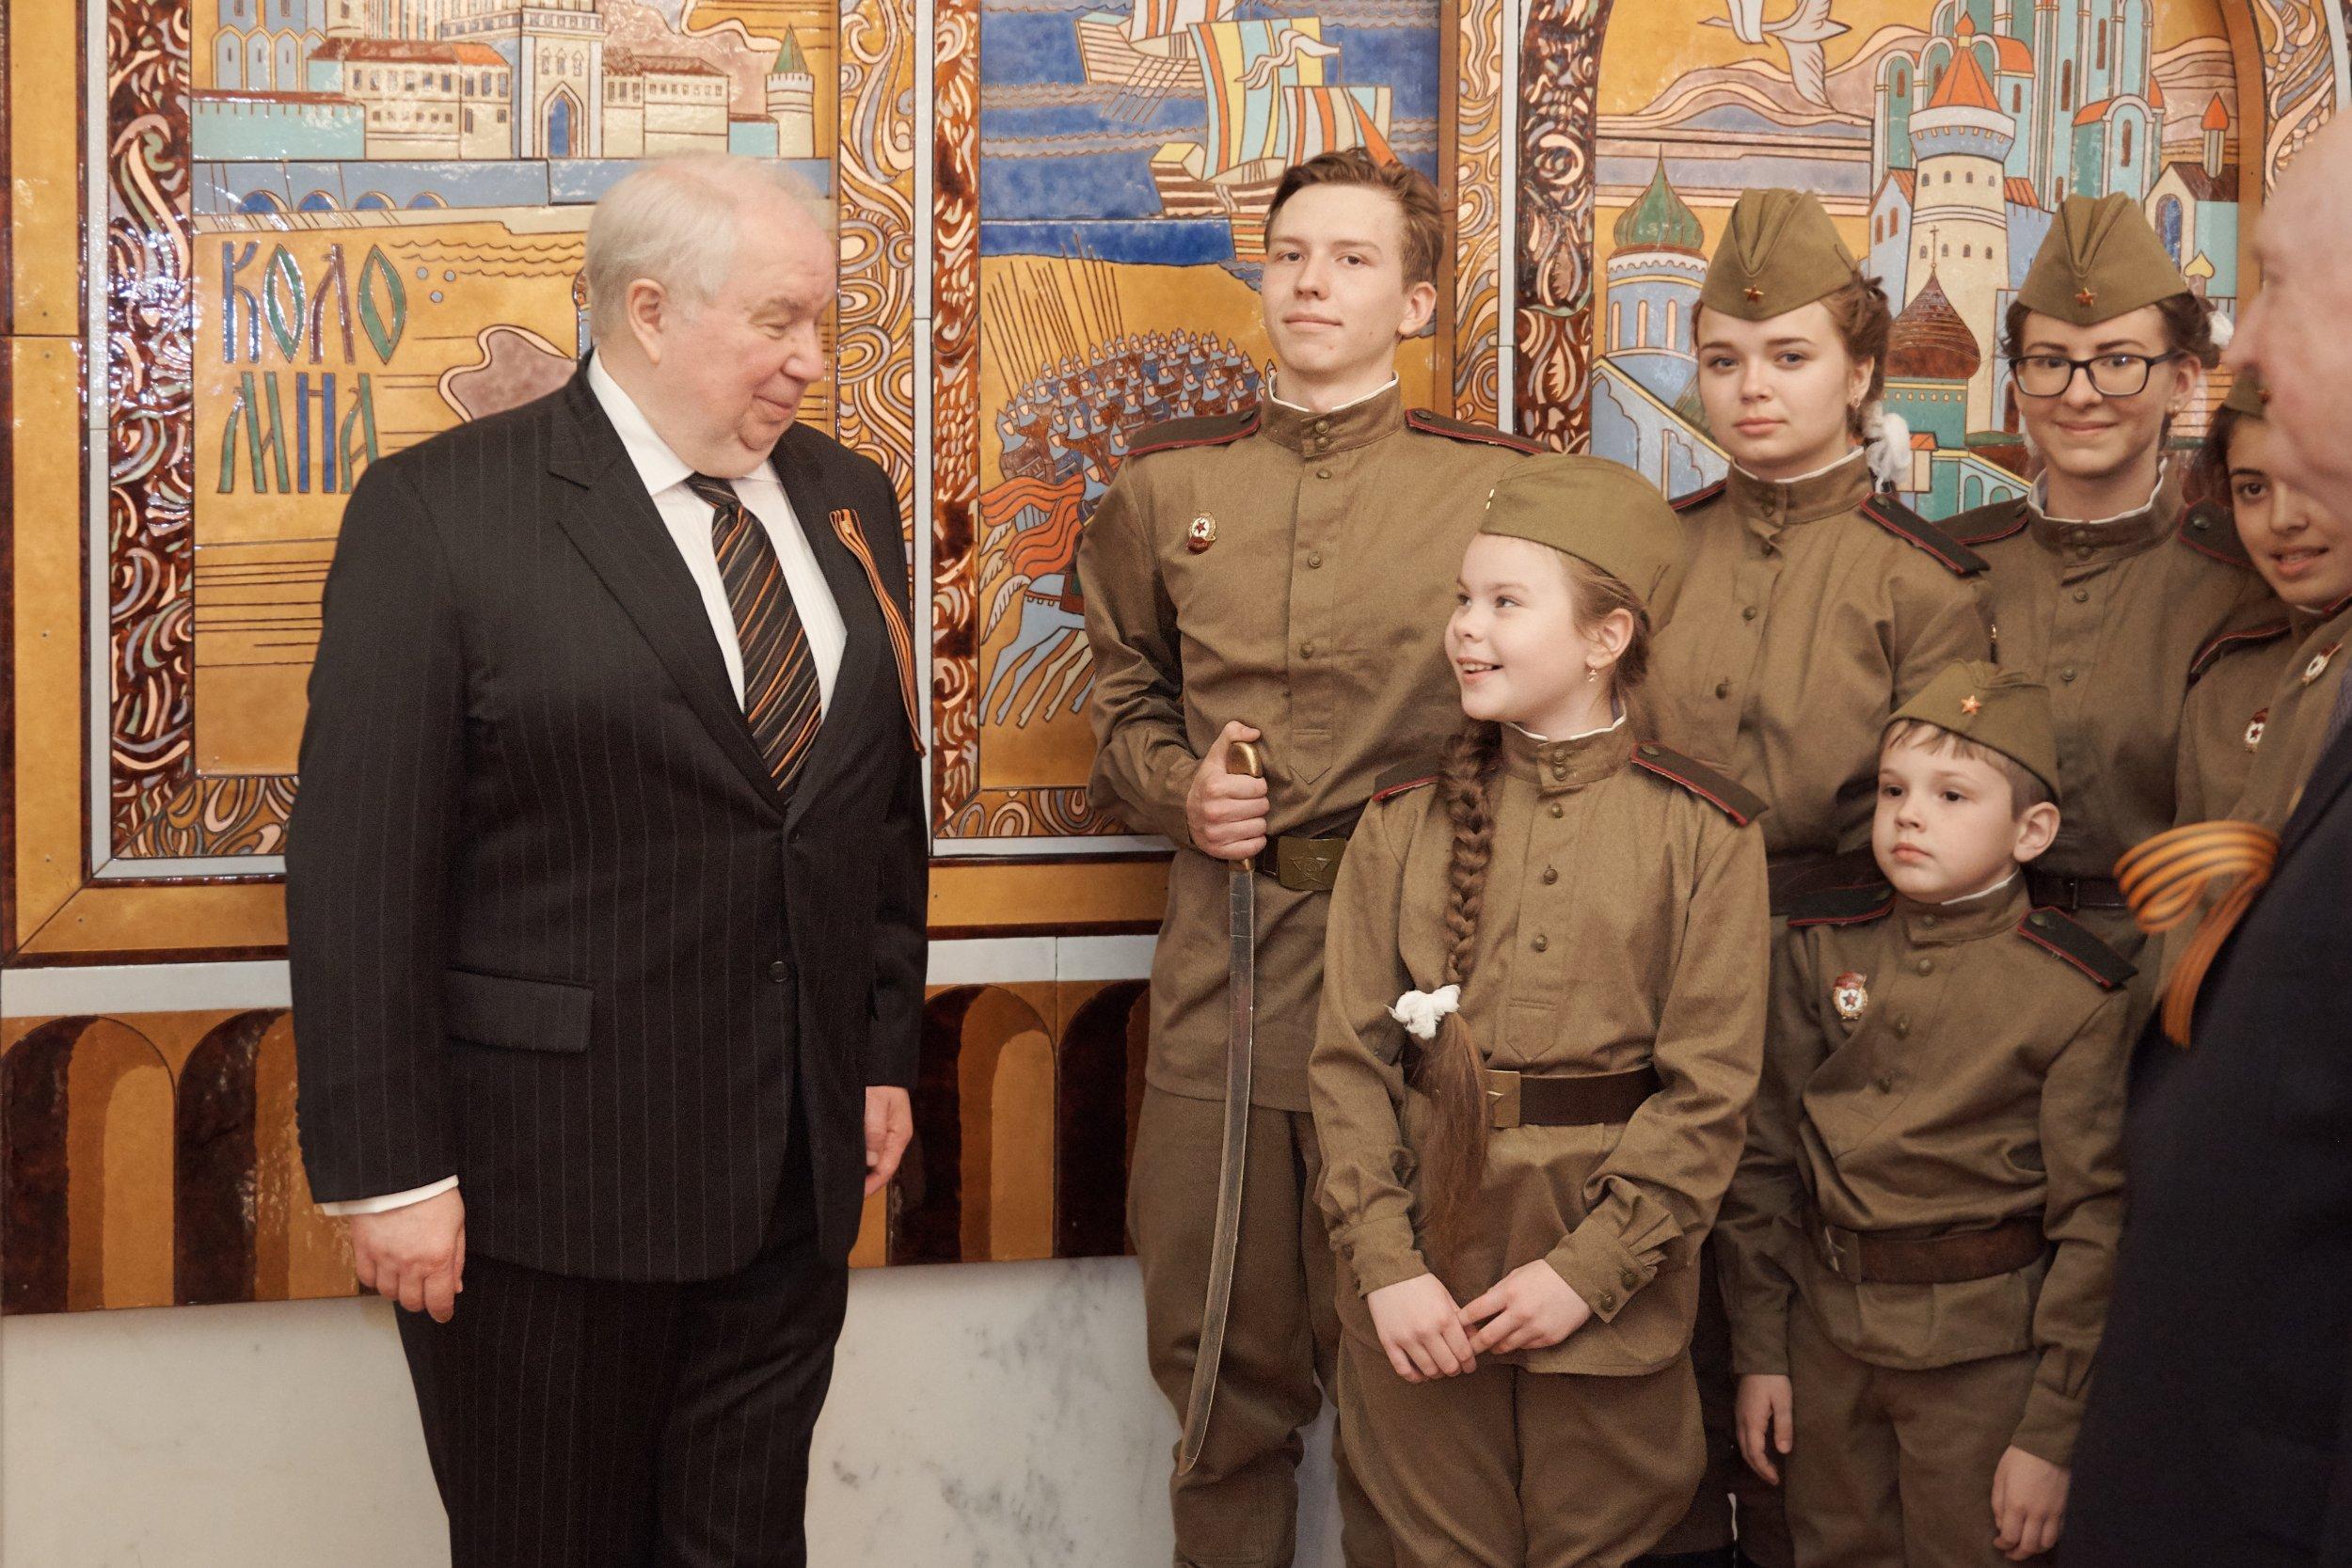 Is Russia's ambassador a spy or diplomat? Meet Sergey Kislyak, the most radioactive man in Washington